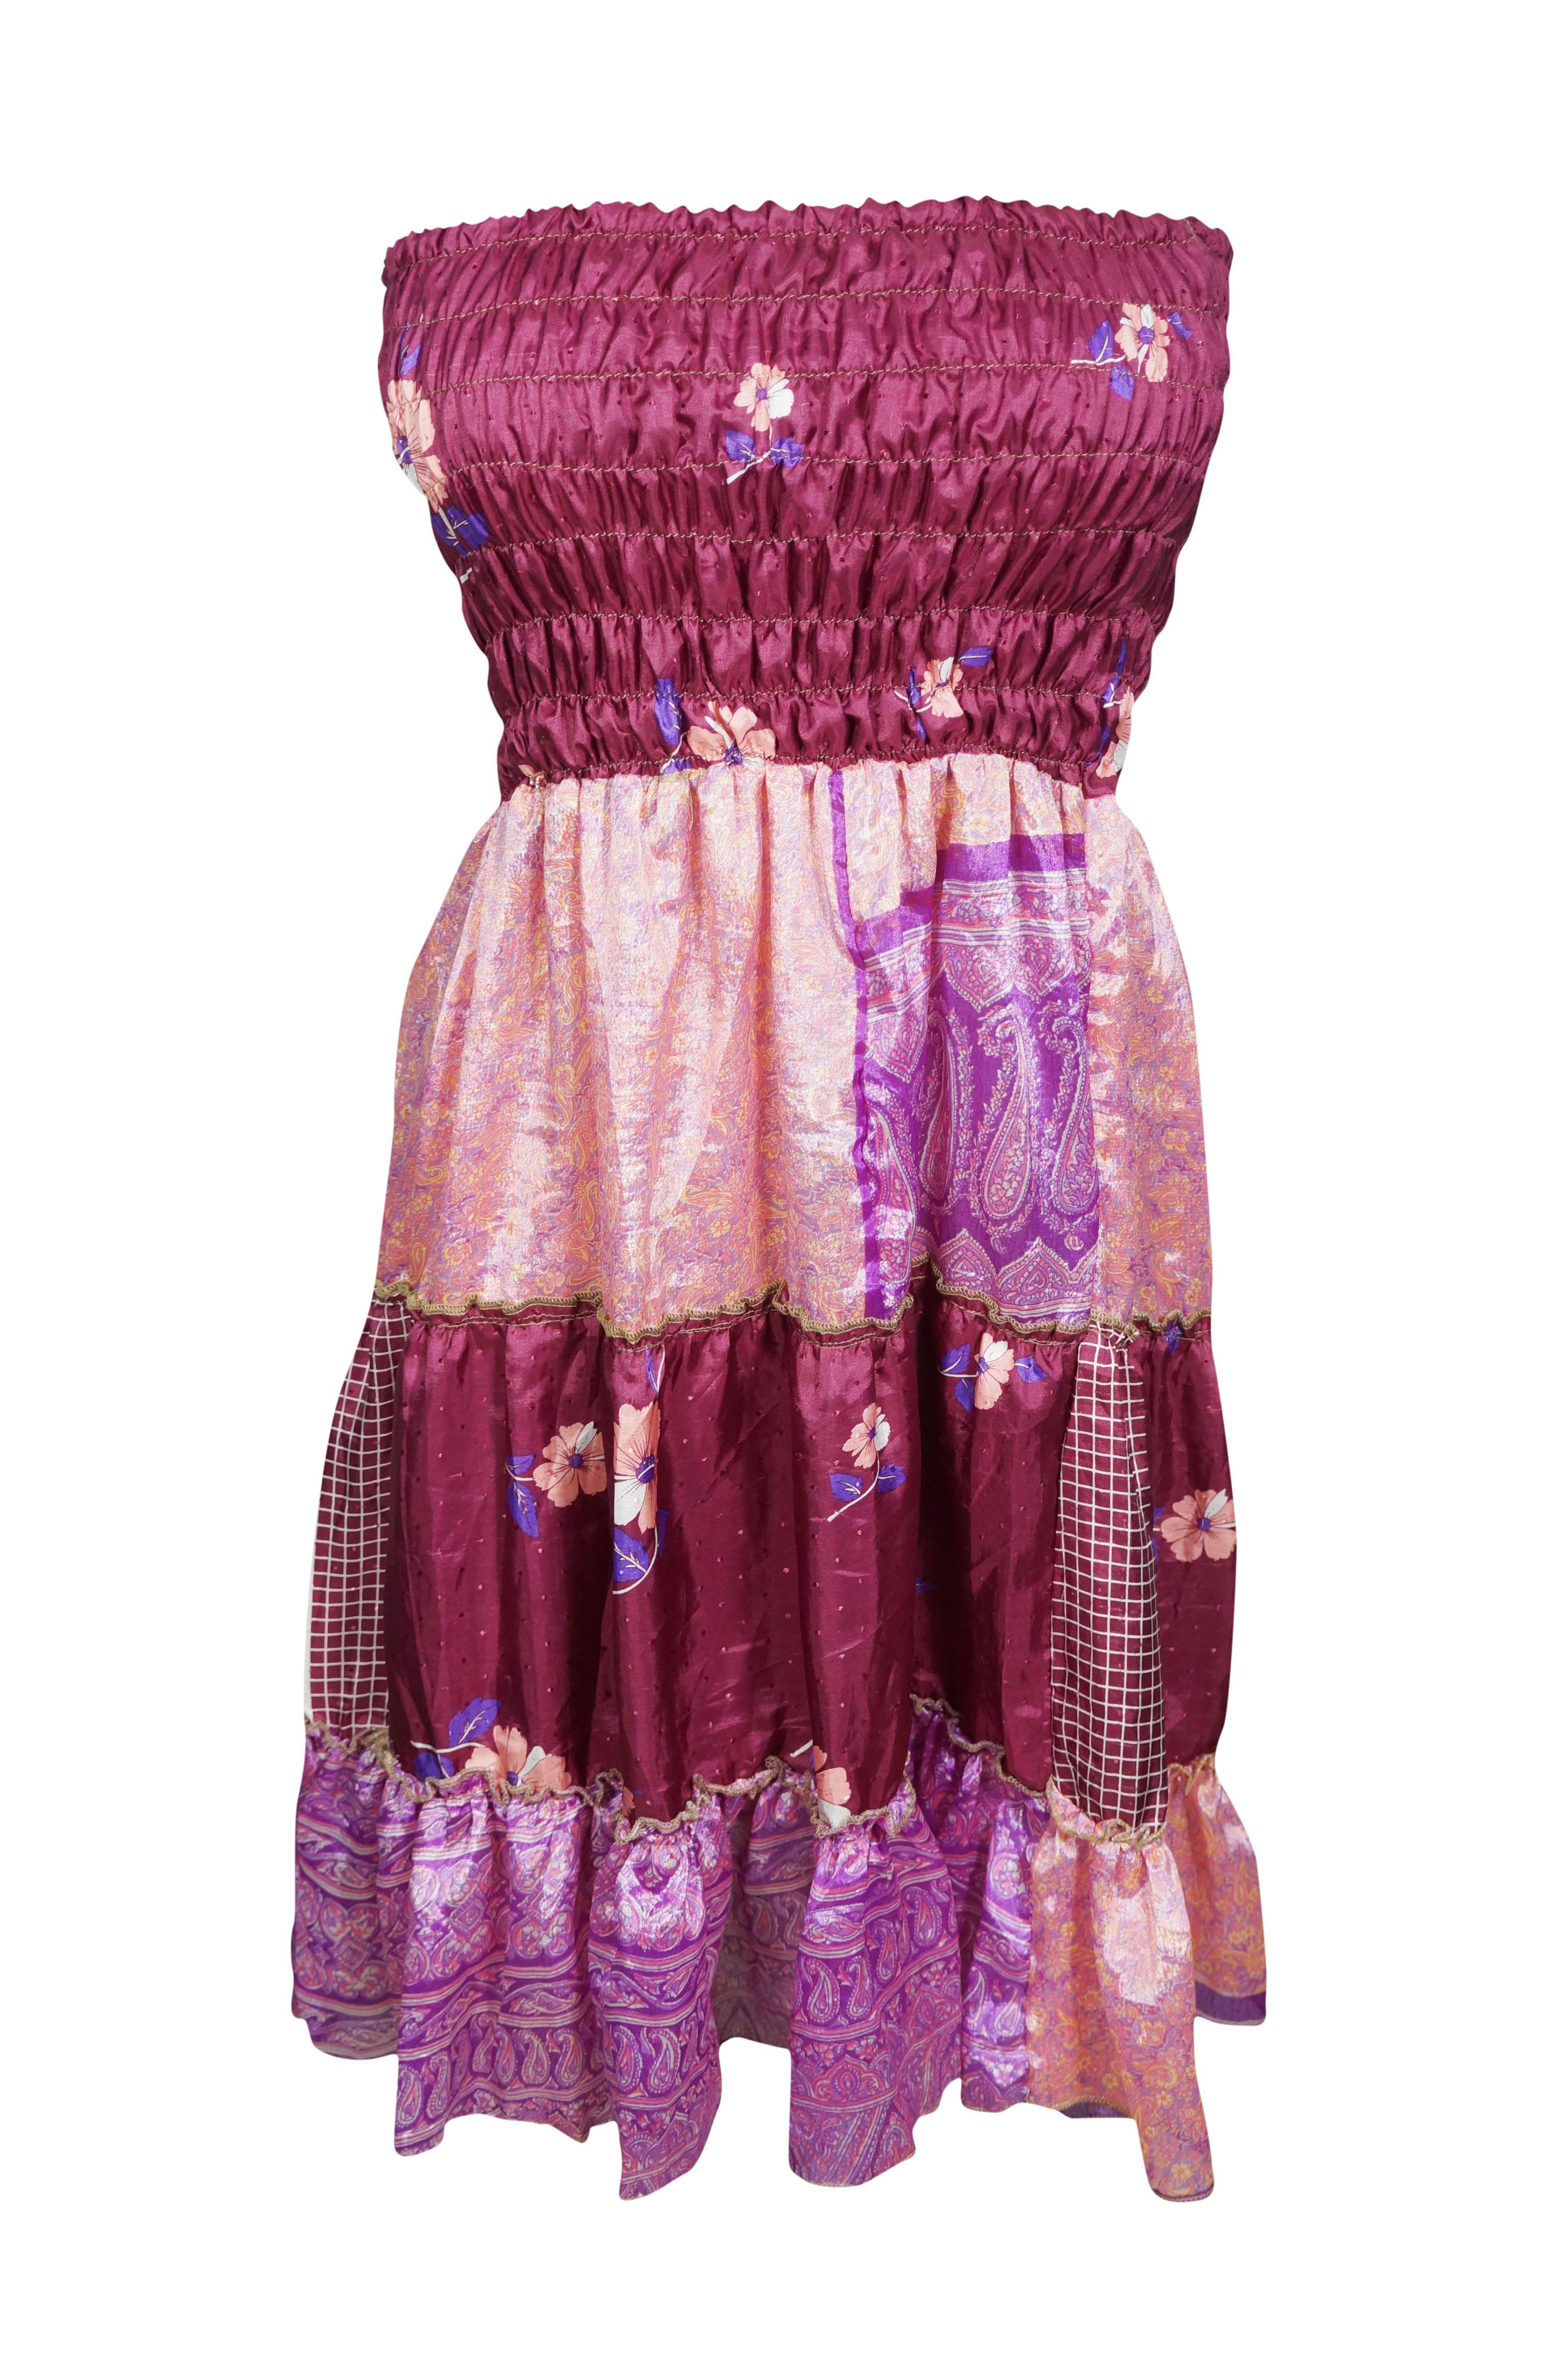 2fe1afcc6895c Mogul Interior - Mogul Womens 2 In 1 Printed Strapless Dress Skirt ...